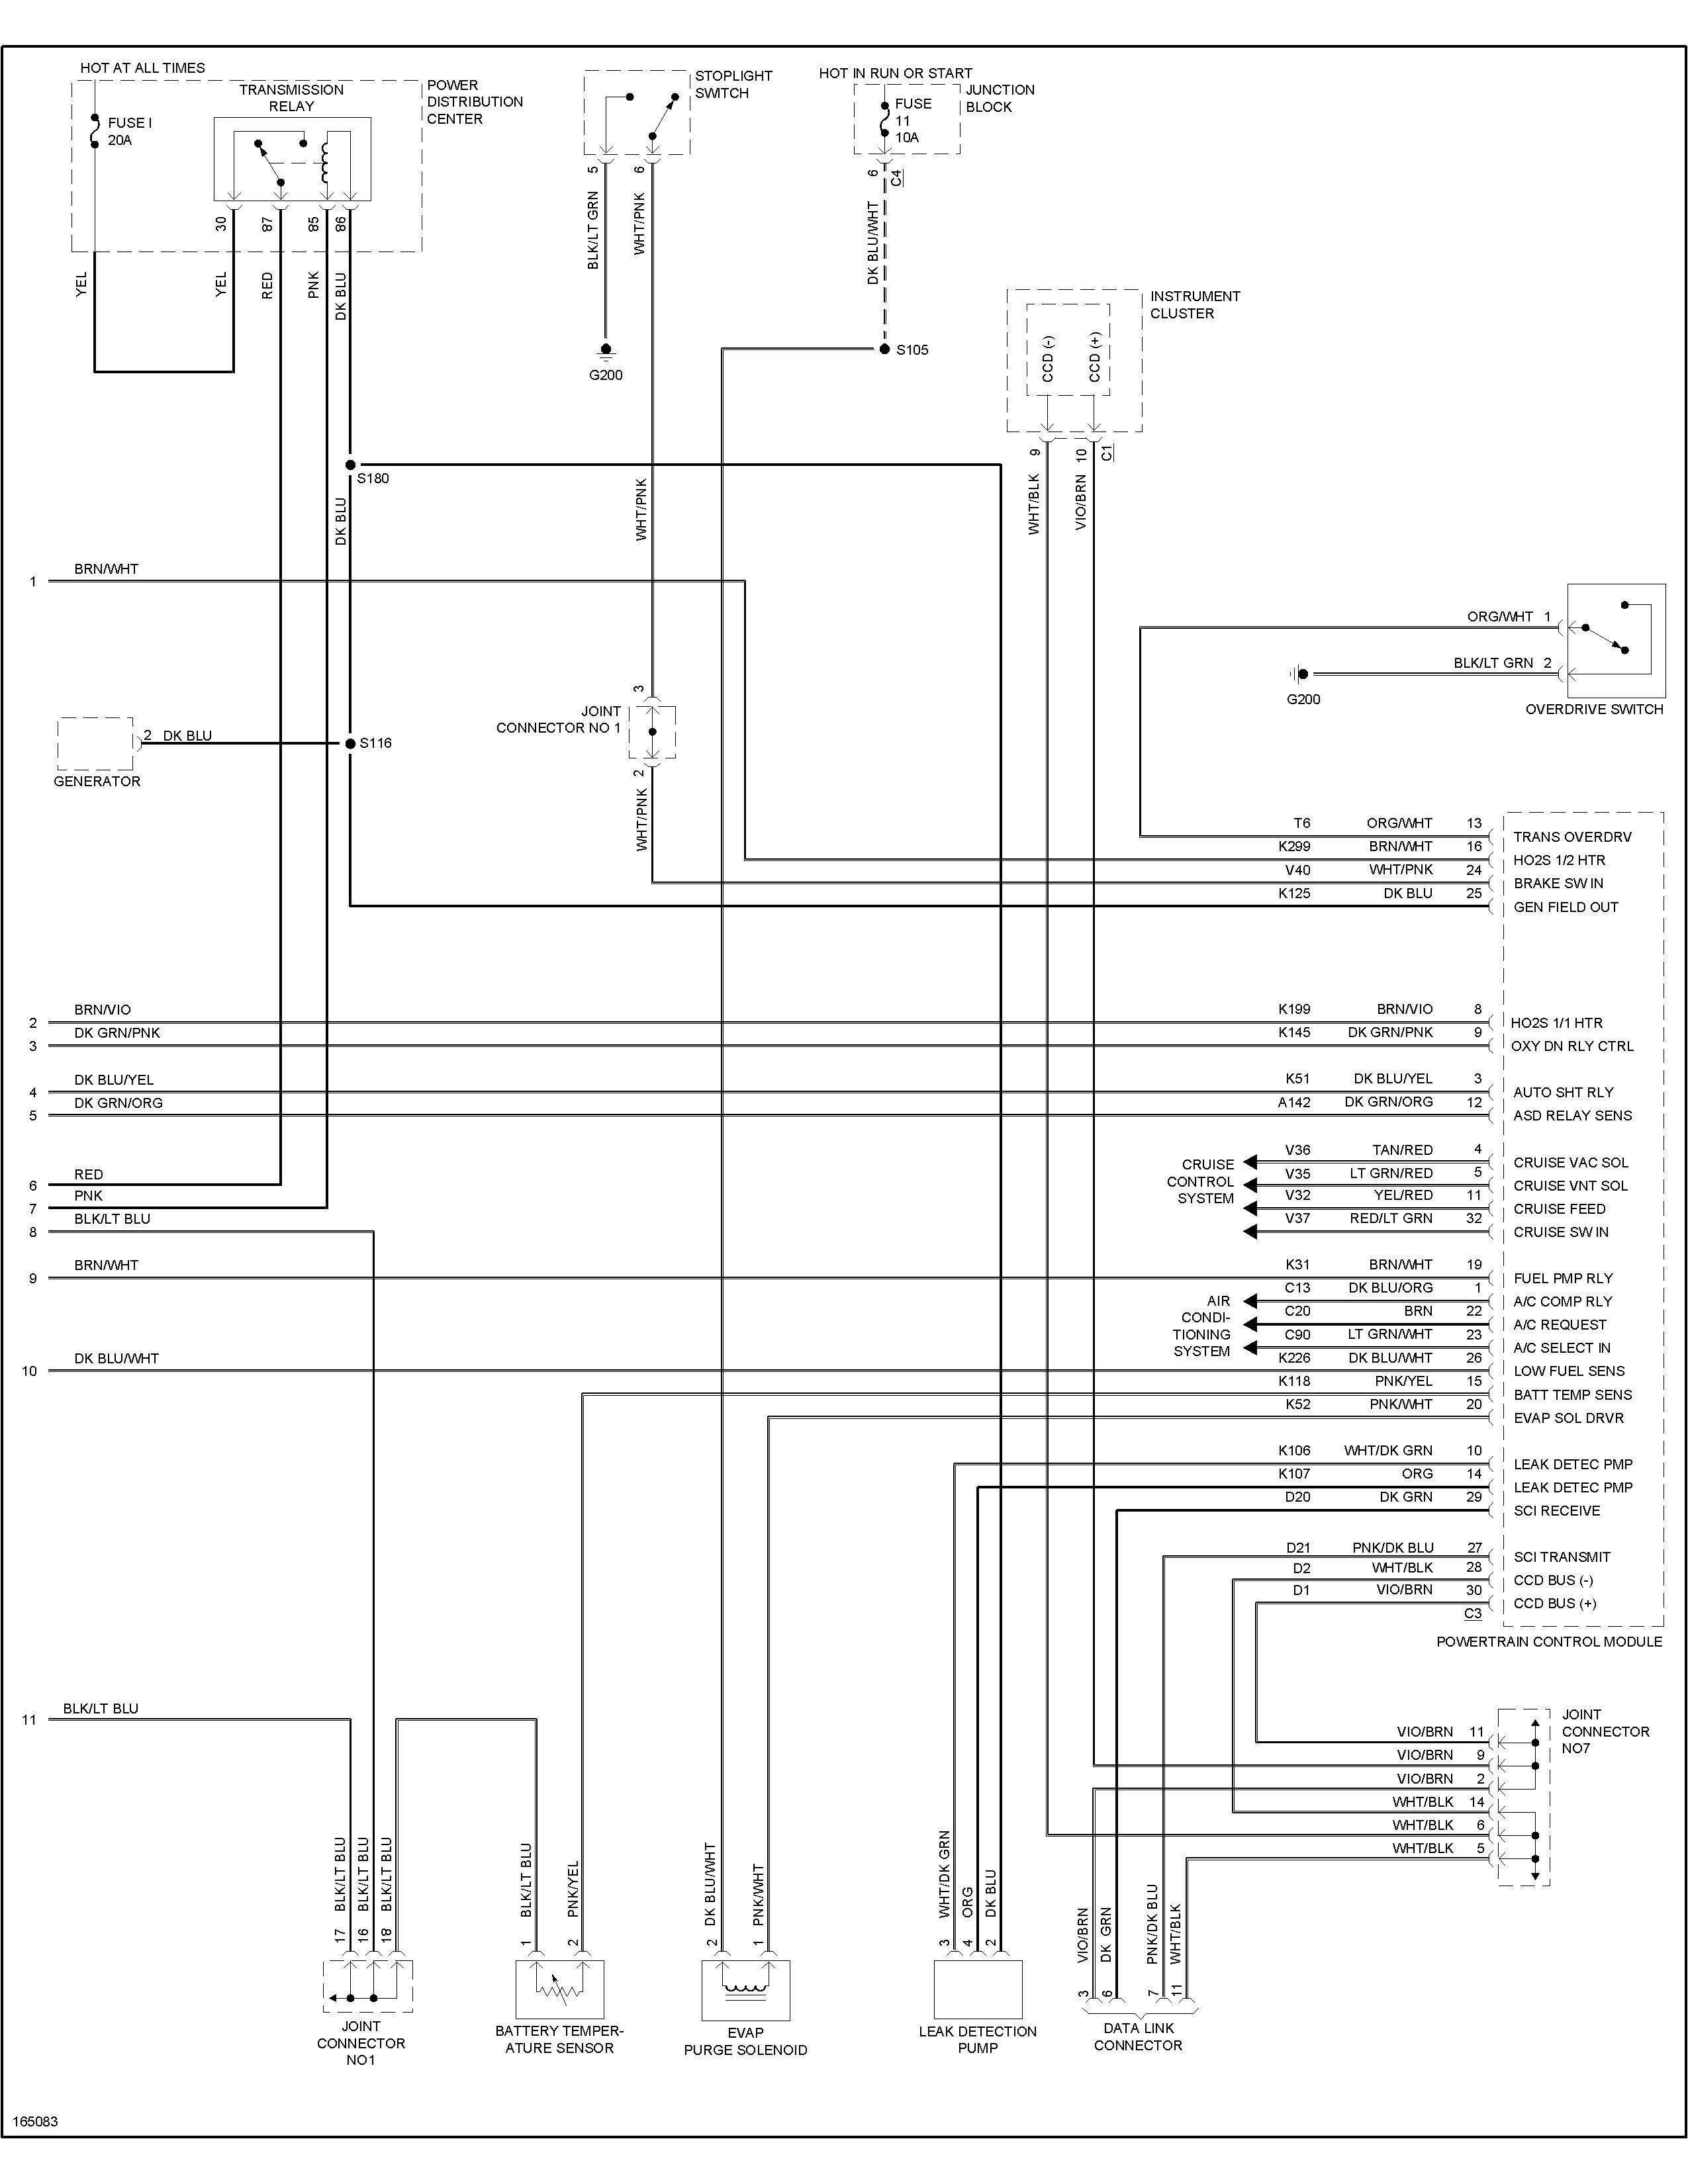 92 dodge diesel wiring diagram 1992    dodge       ram       cummins    12v into 74 winnie brave i need a  1992    dodge       ram       cummins    12v into 74 winnie brave i need a